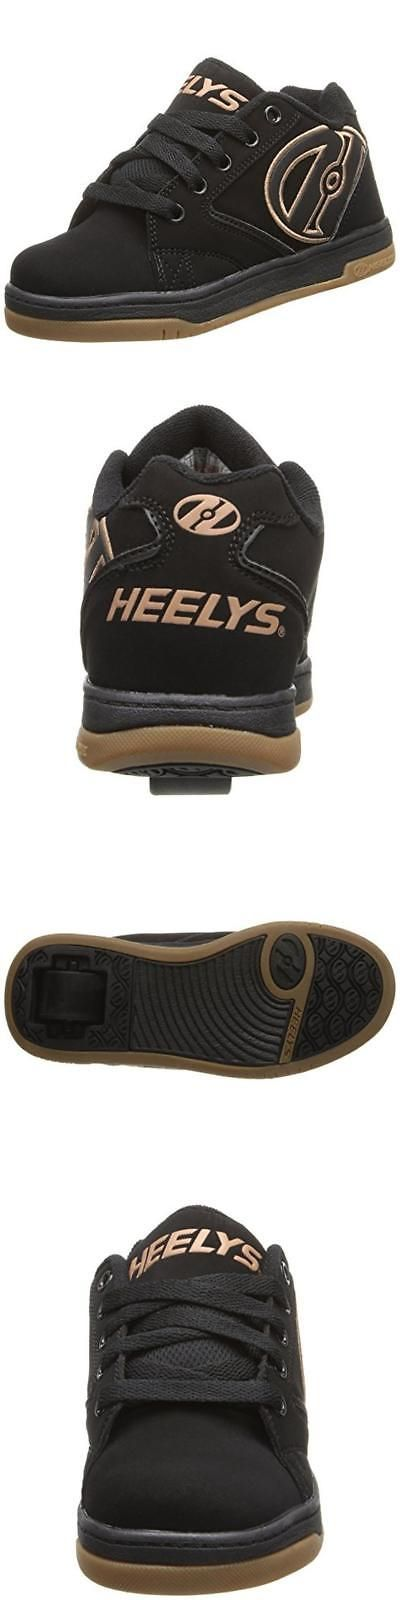 Youth 159072: Heelys 4918 Boys Propel 2.0 Black Little Kid Skate Shoes 1 Medium (D) Bhfo -> BUY IT NOW ONLY: $34.99 on eBay!